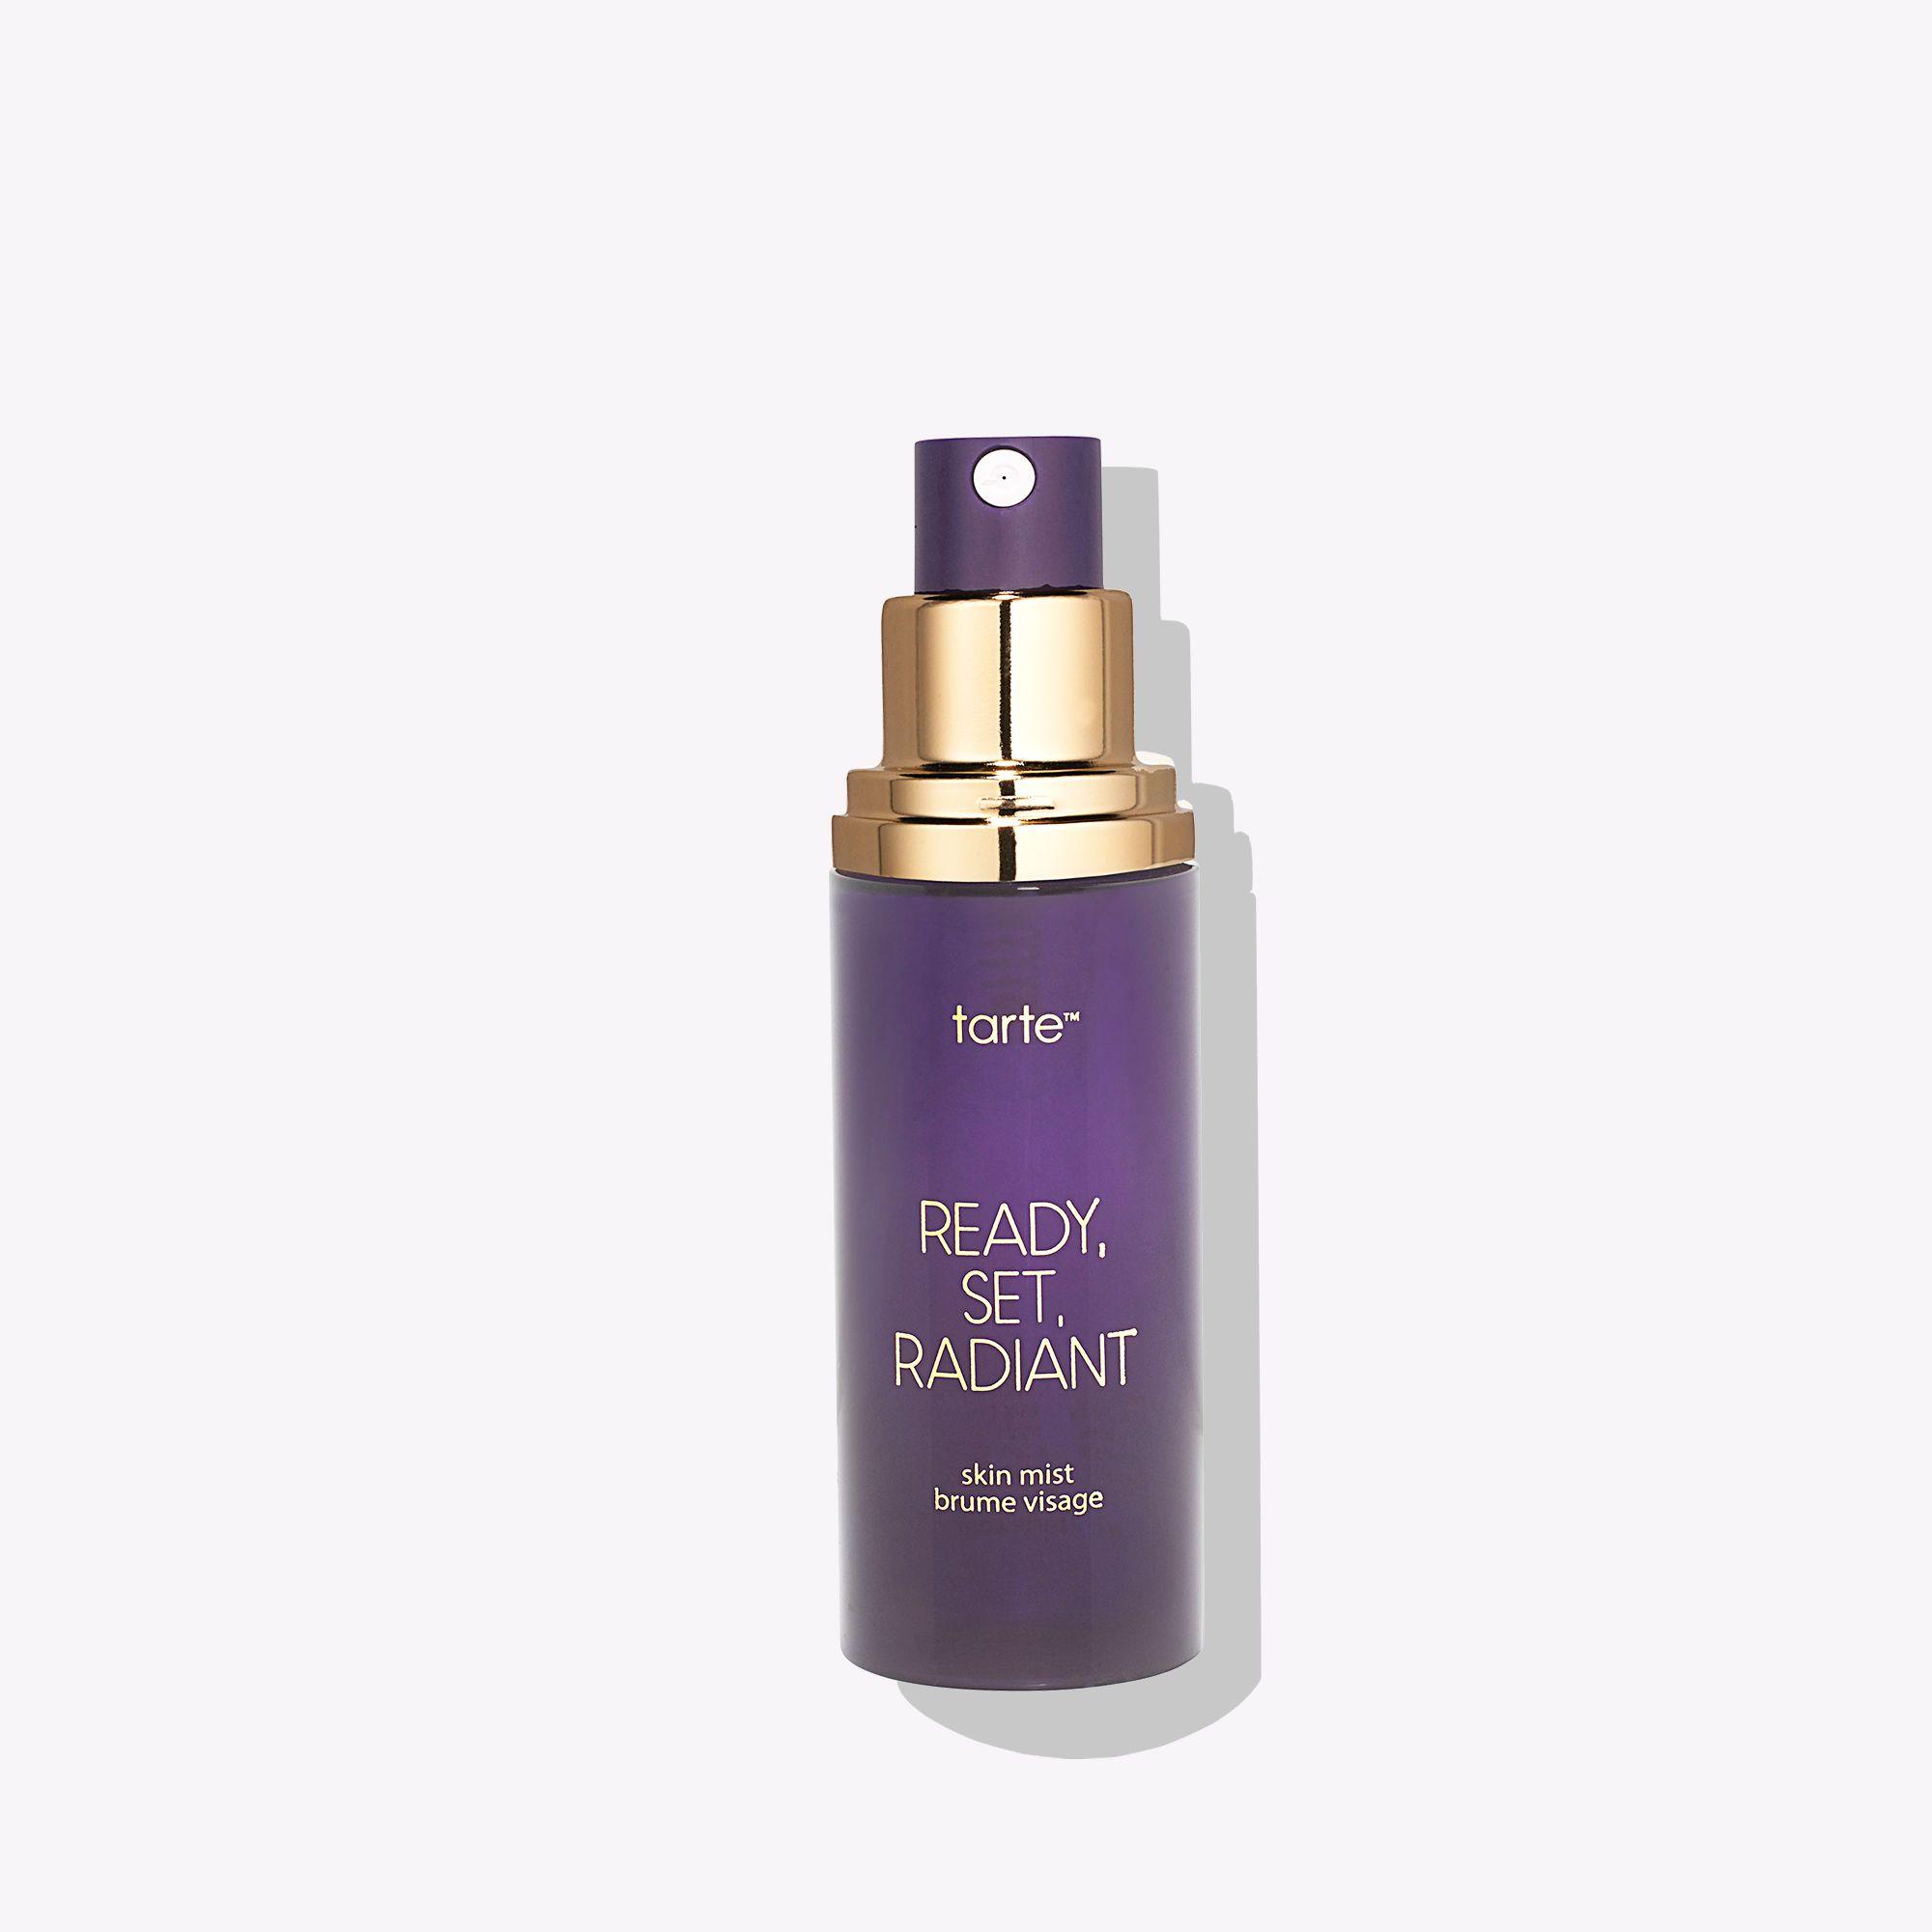 Travel Size Ready, Set, Radiant Skin Mist Makeup spray